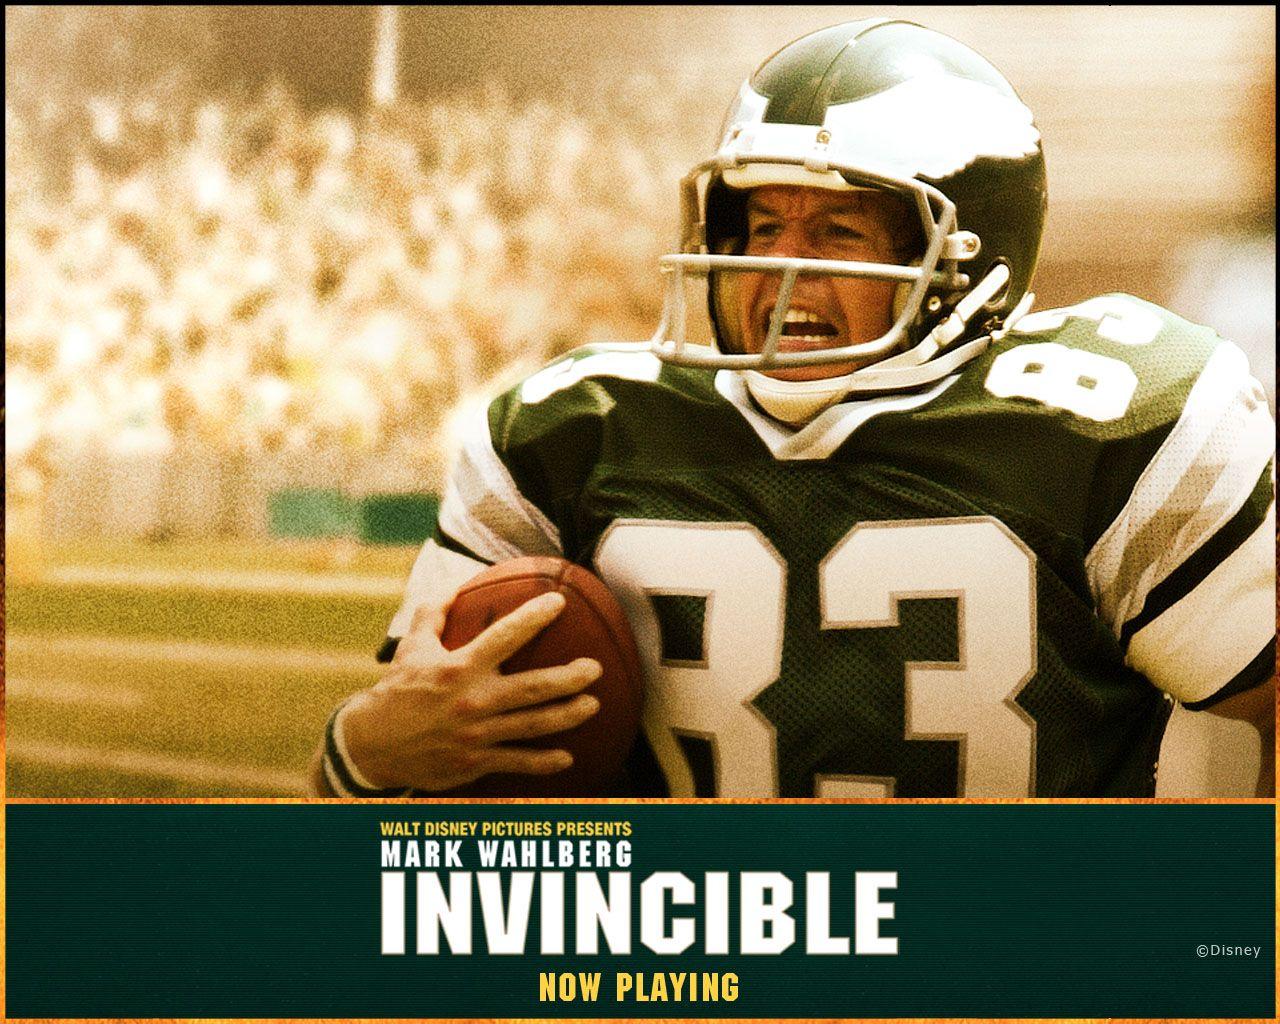 Invincible 2006 Mike Movie Invincible Movie Mark Wahlberg